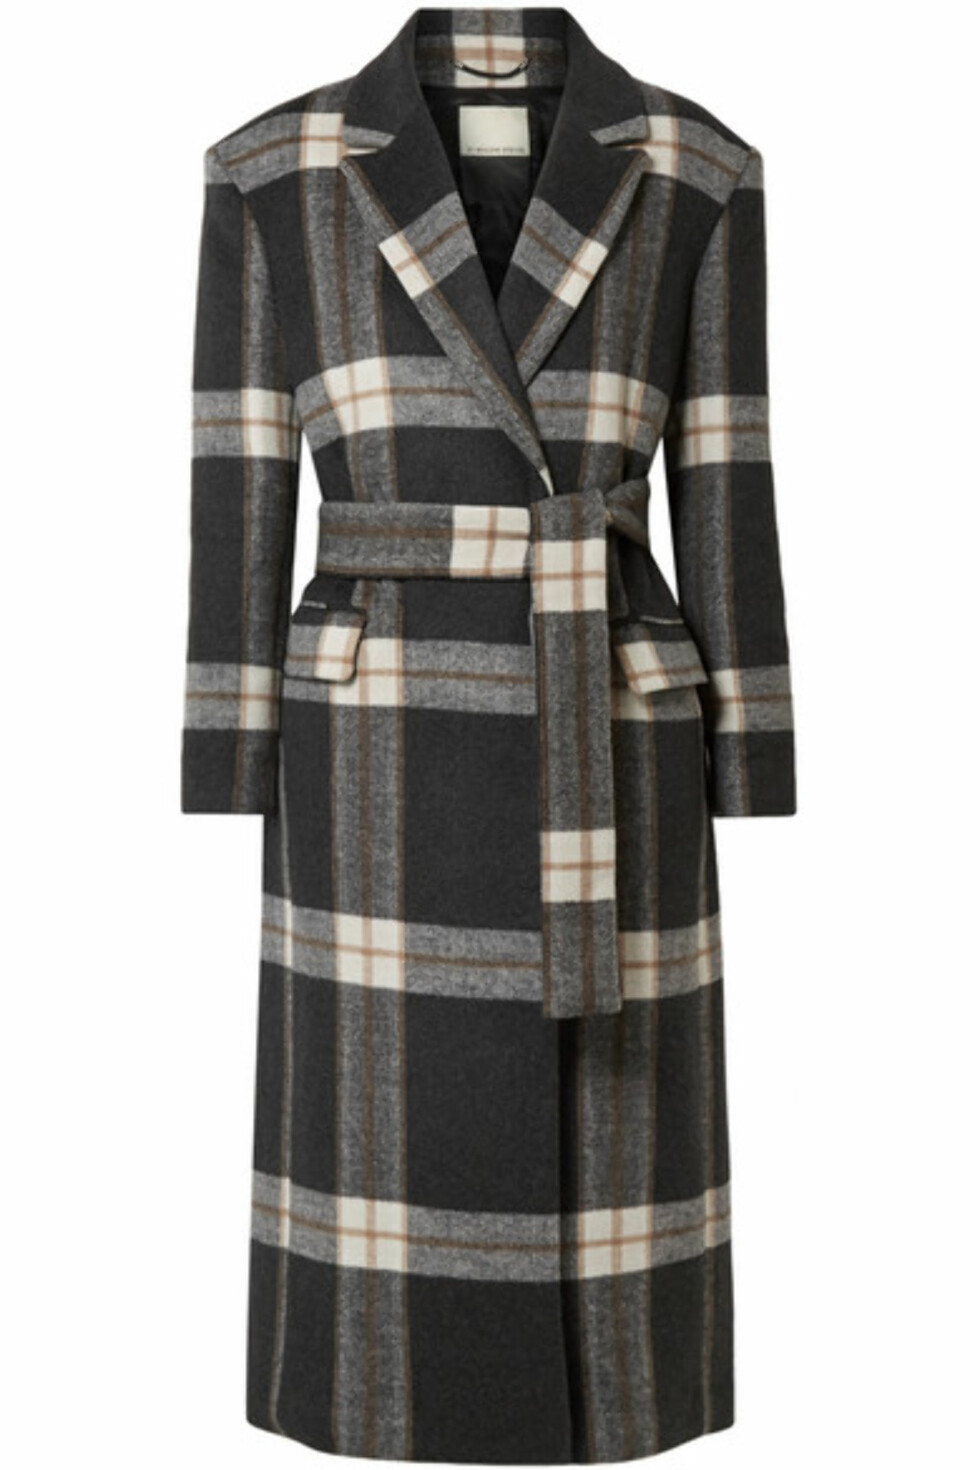 Kåpe fra By Malene Birger |6000,-| https://www.net-a-porter.com/no/en/product/991827/By_Malene_Birger/mariana-checked-brushed-felt-coat